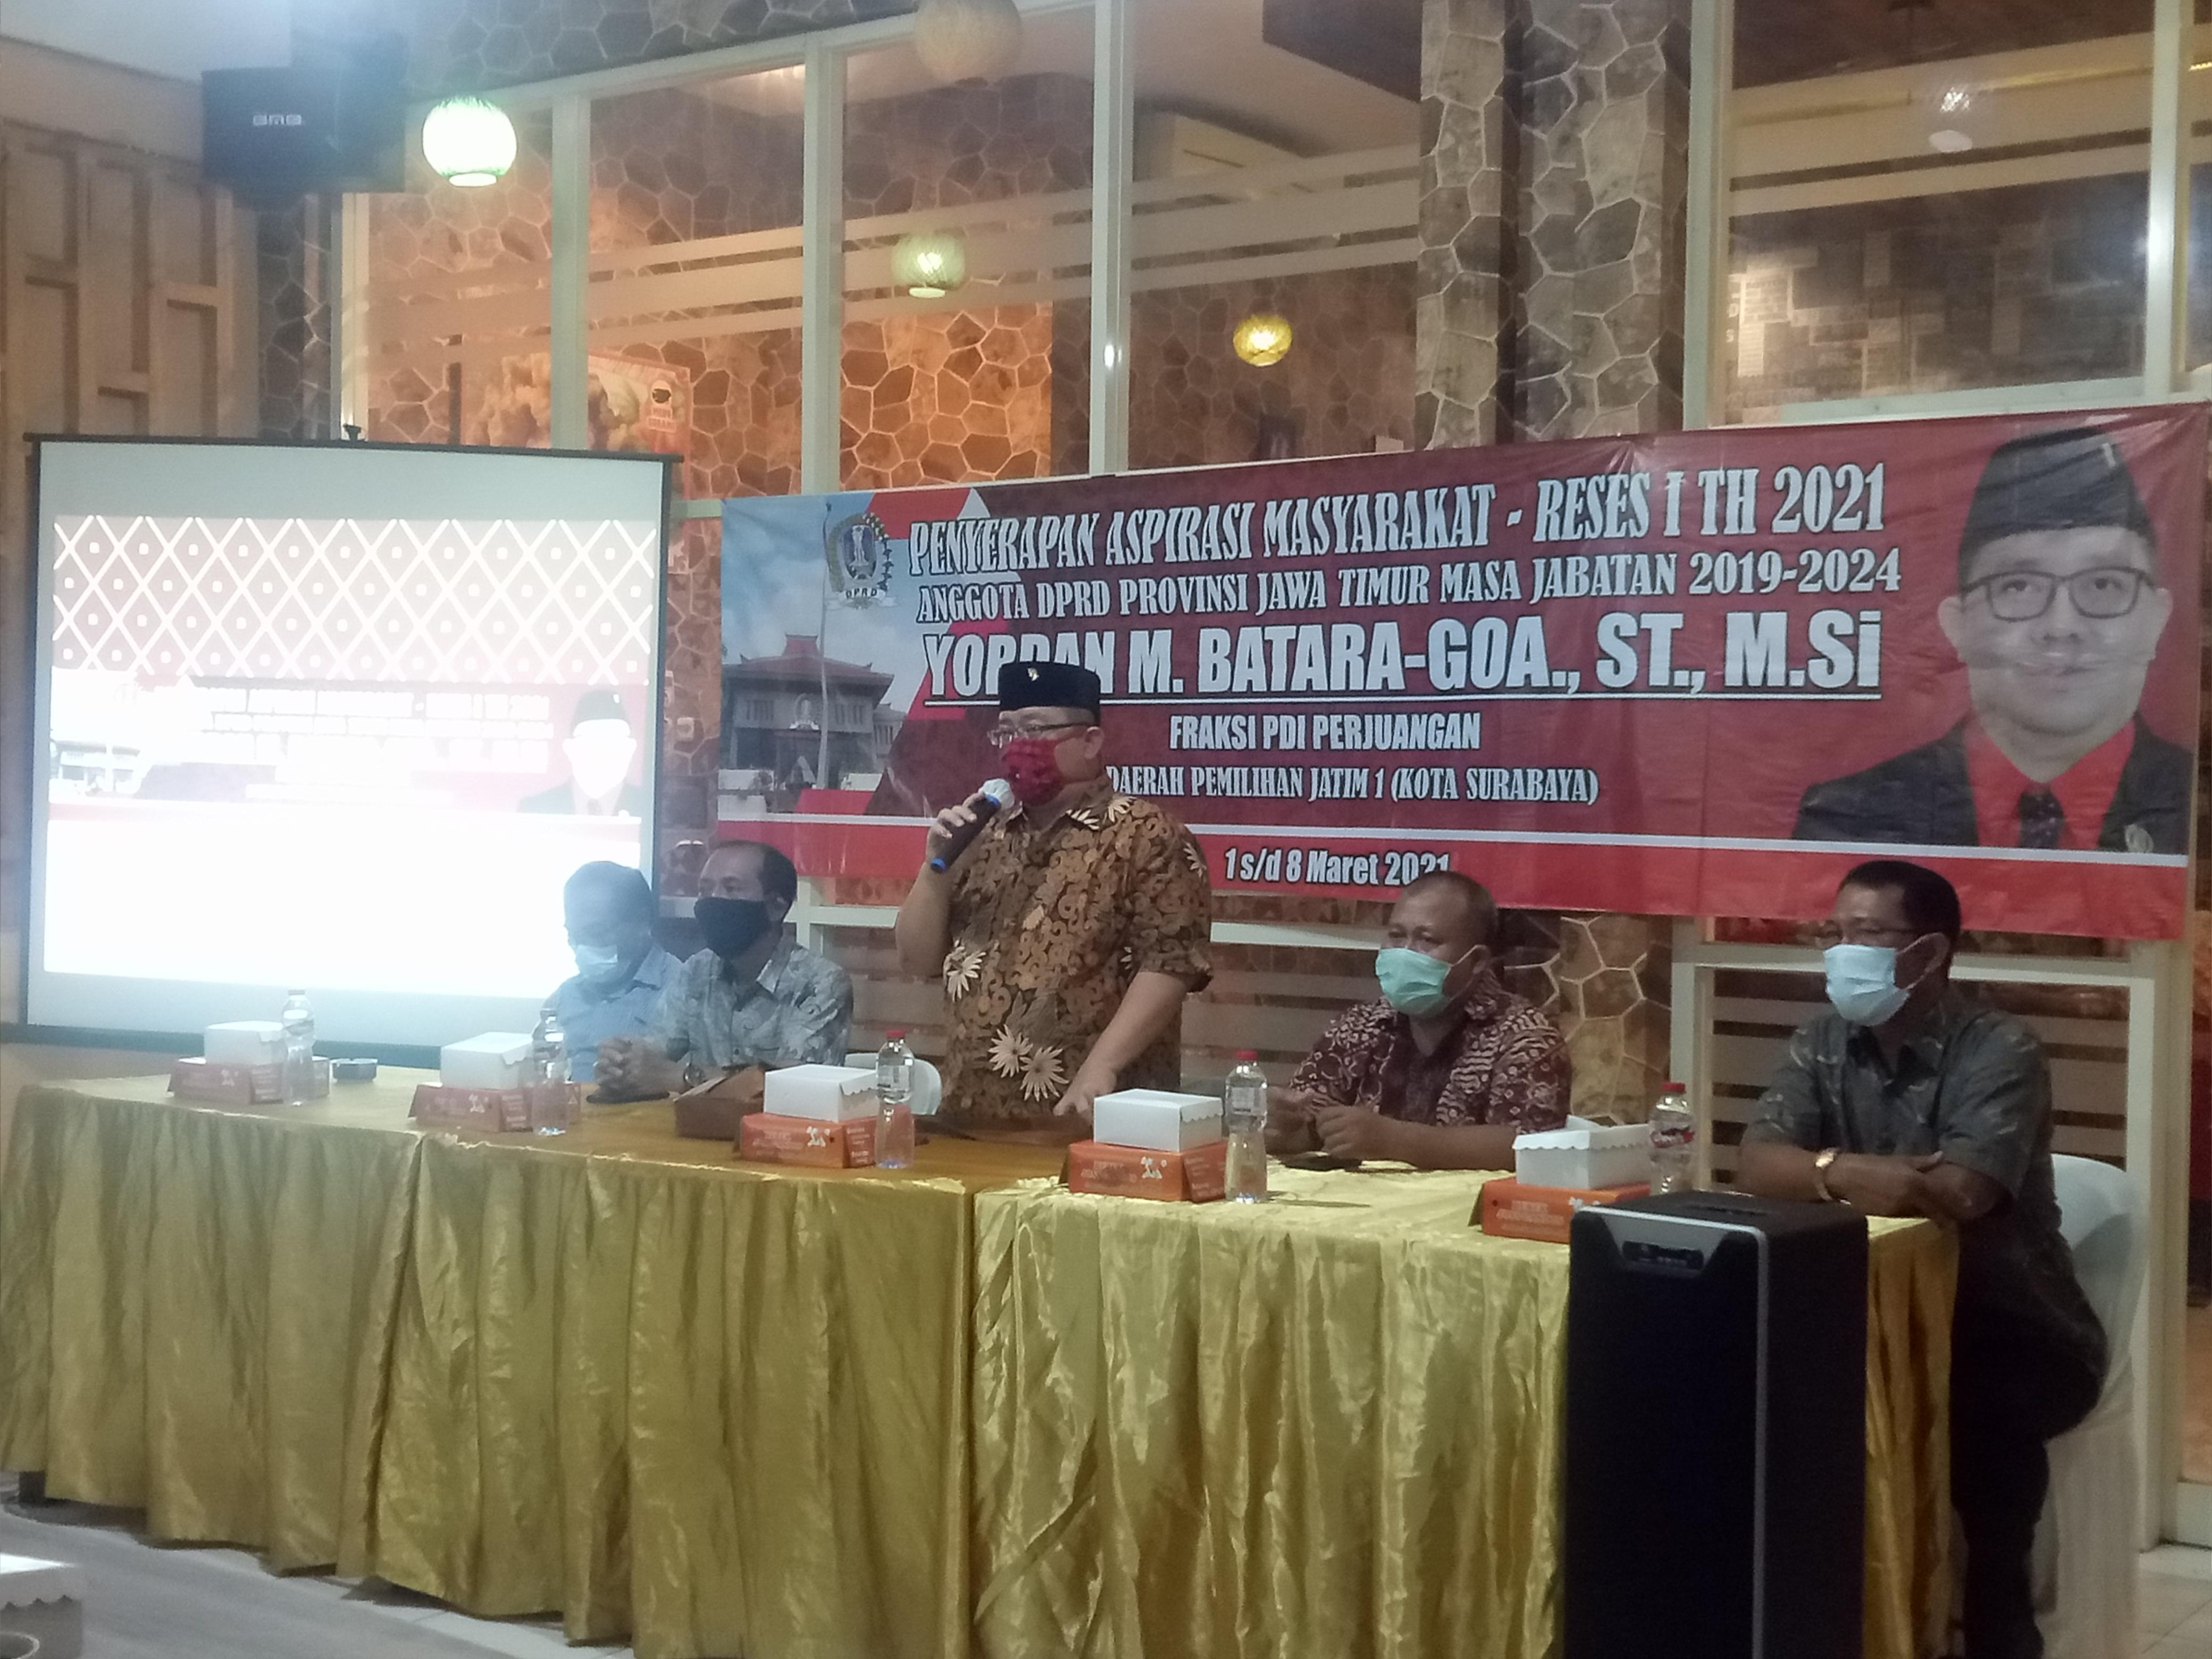 Gelar Reses, Yordan Tampung Keluhan Masyarakat Surabaya